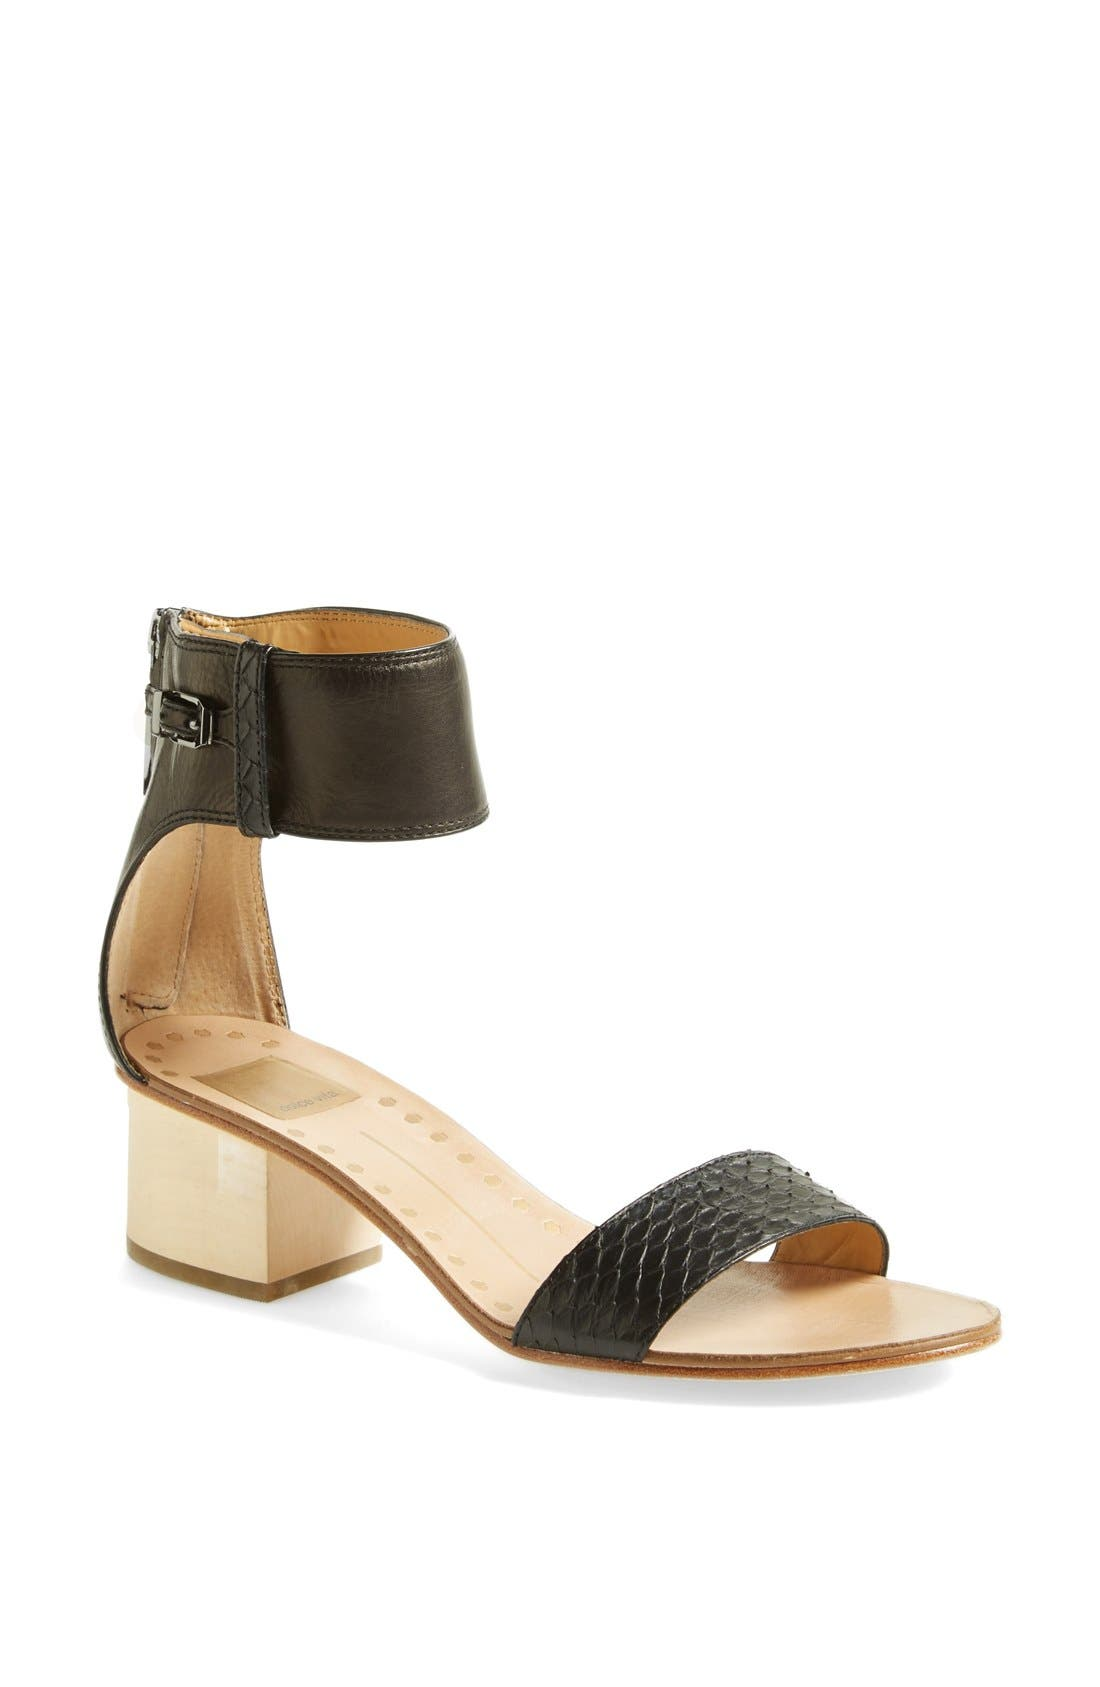 Alternate Image 1 Selected - Dolce Vita 'Foxie' Snakeskin & Leather Sandal